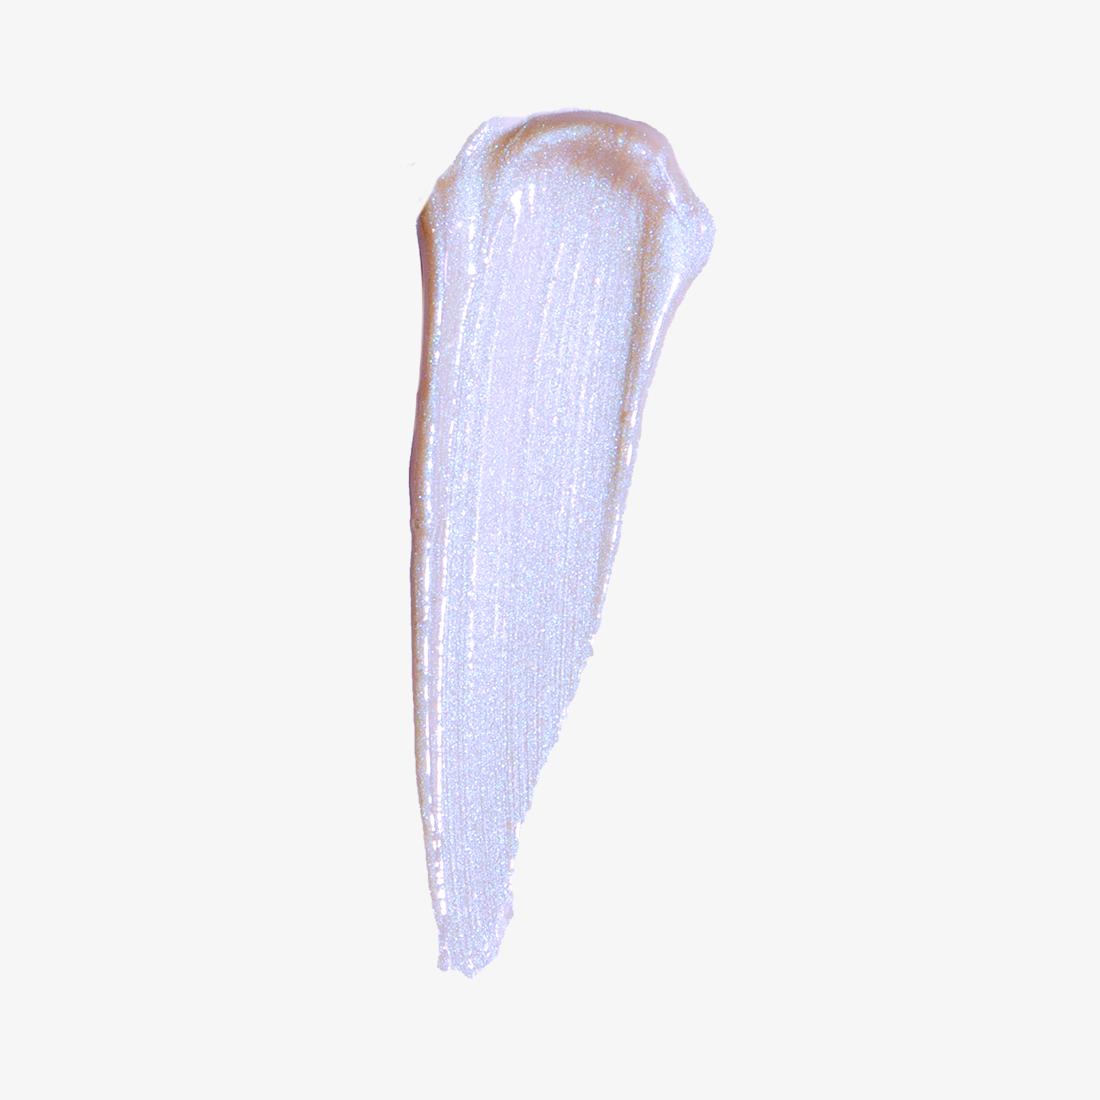 PSYCHEDELIPS Holographic Lip Fluid | www lumene com |